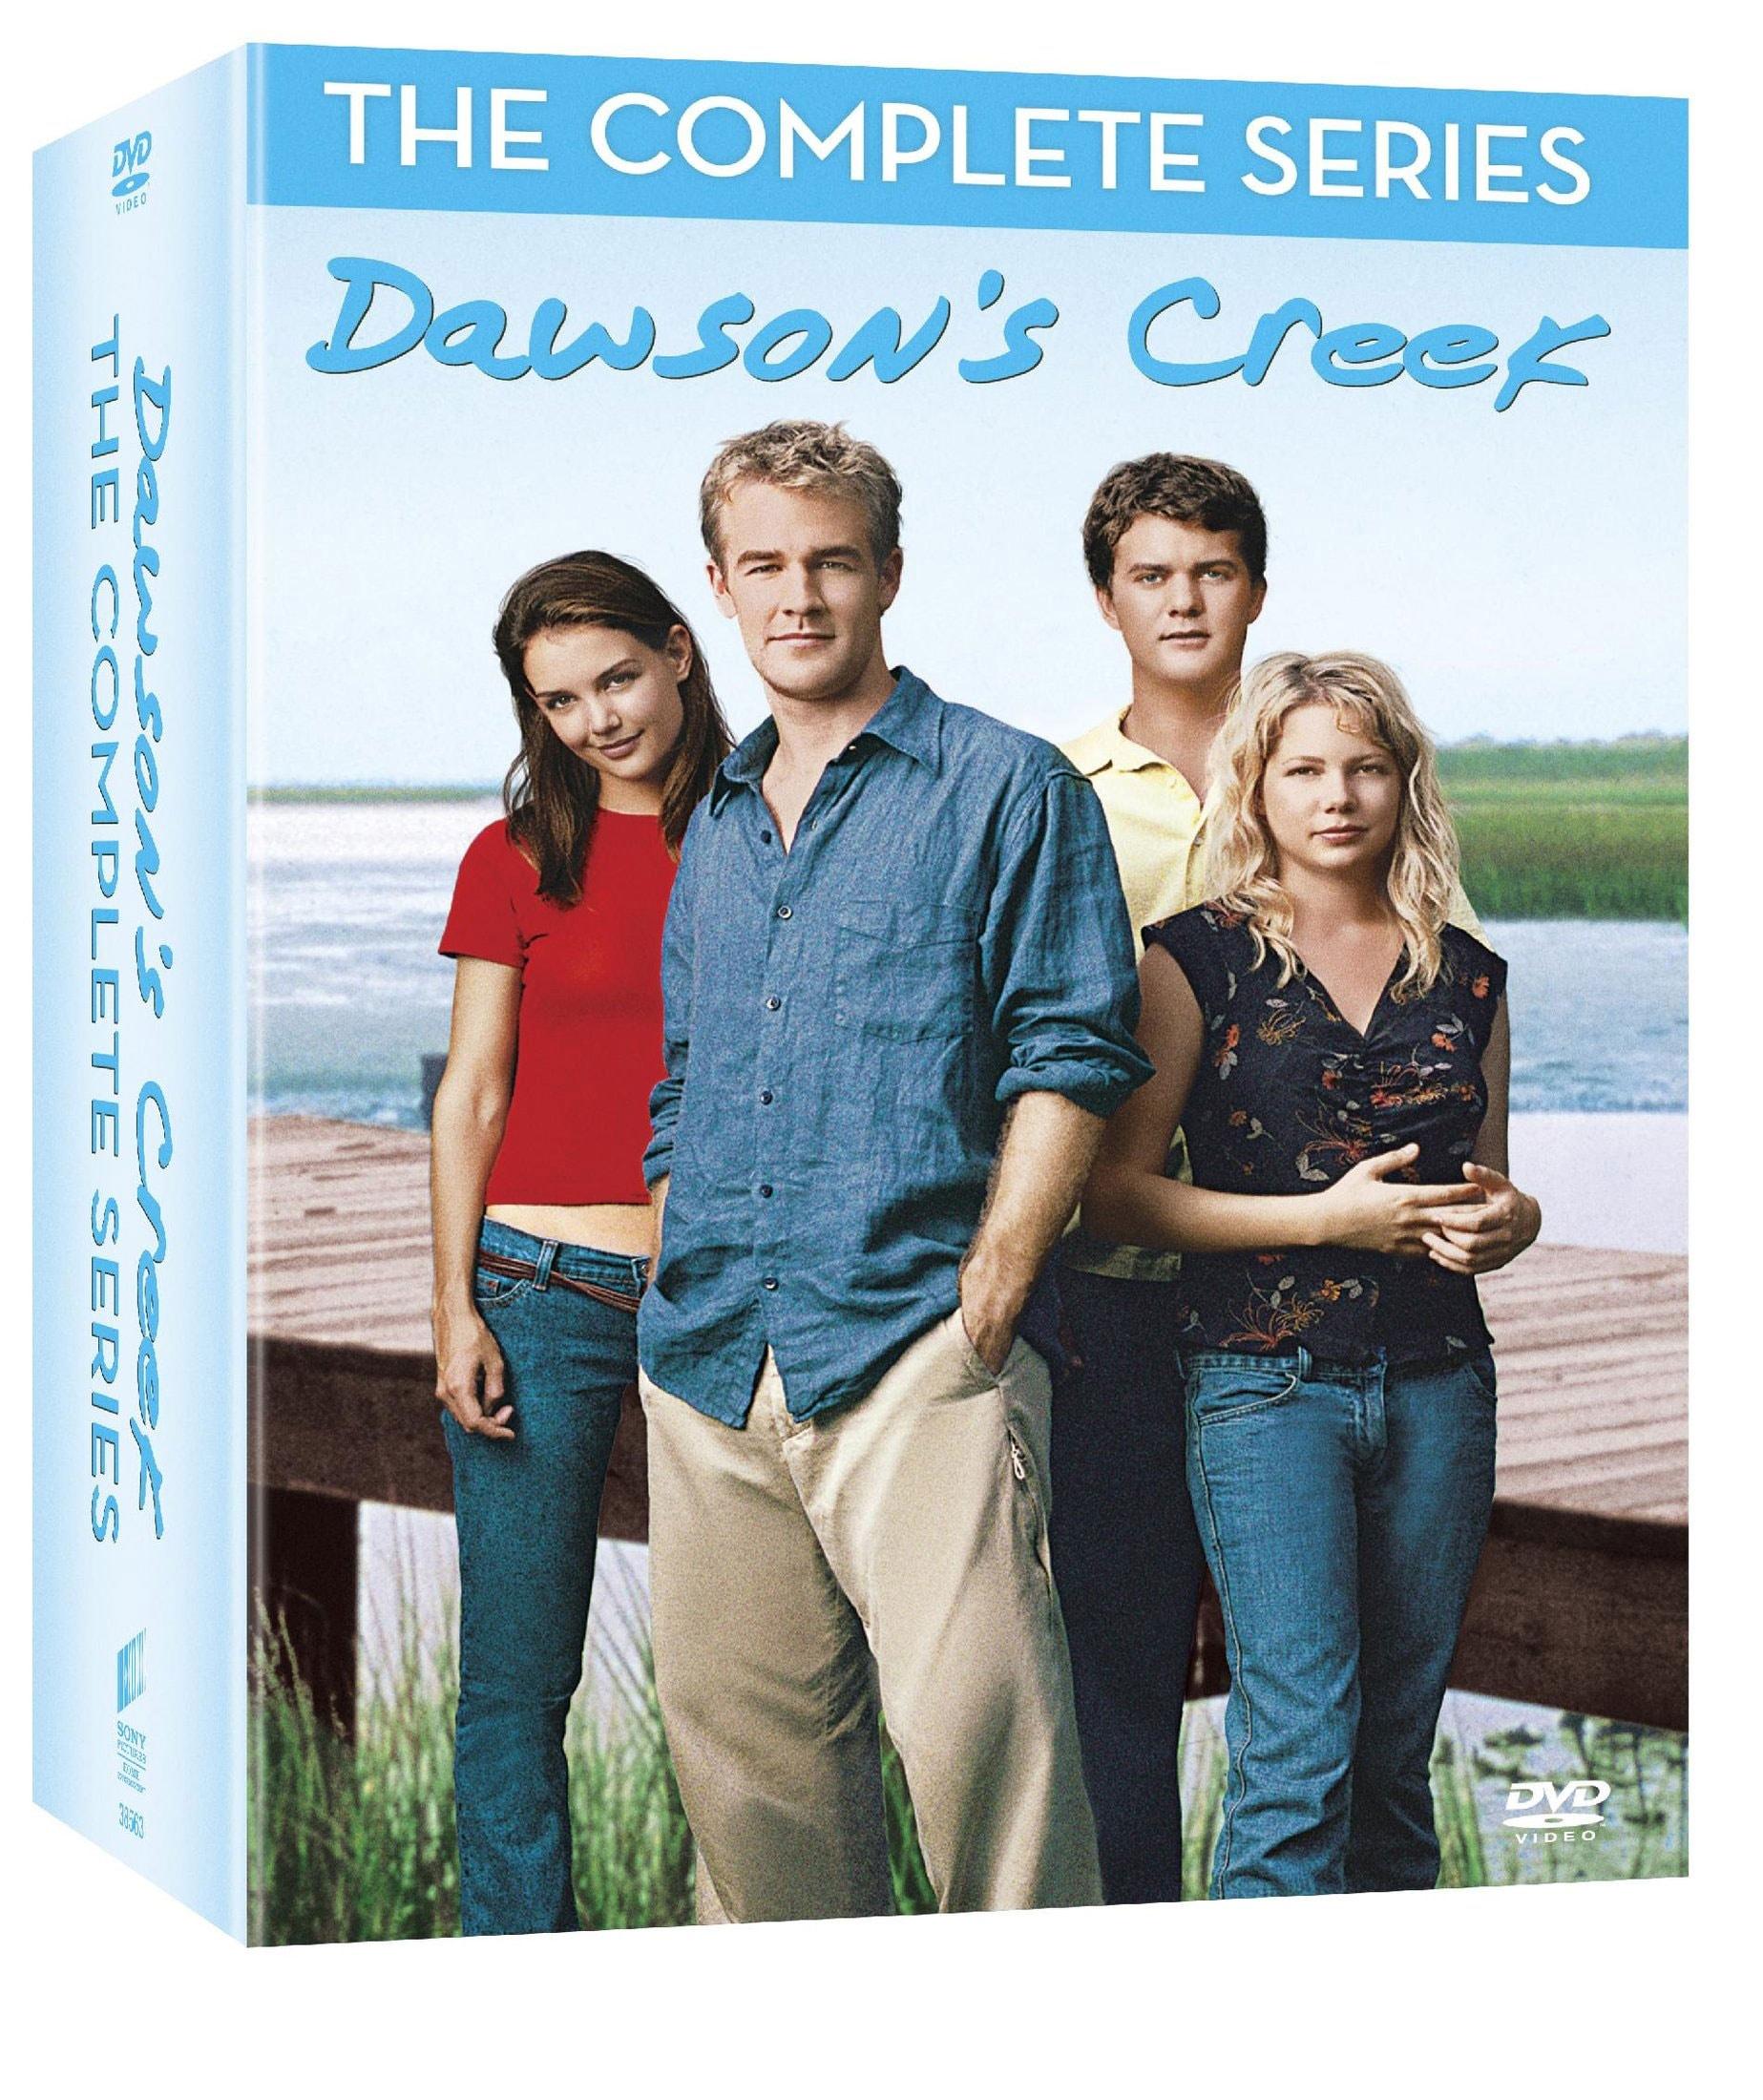 Dawson's Creek: The Complete Series (DVD)